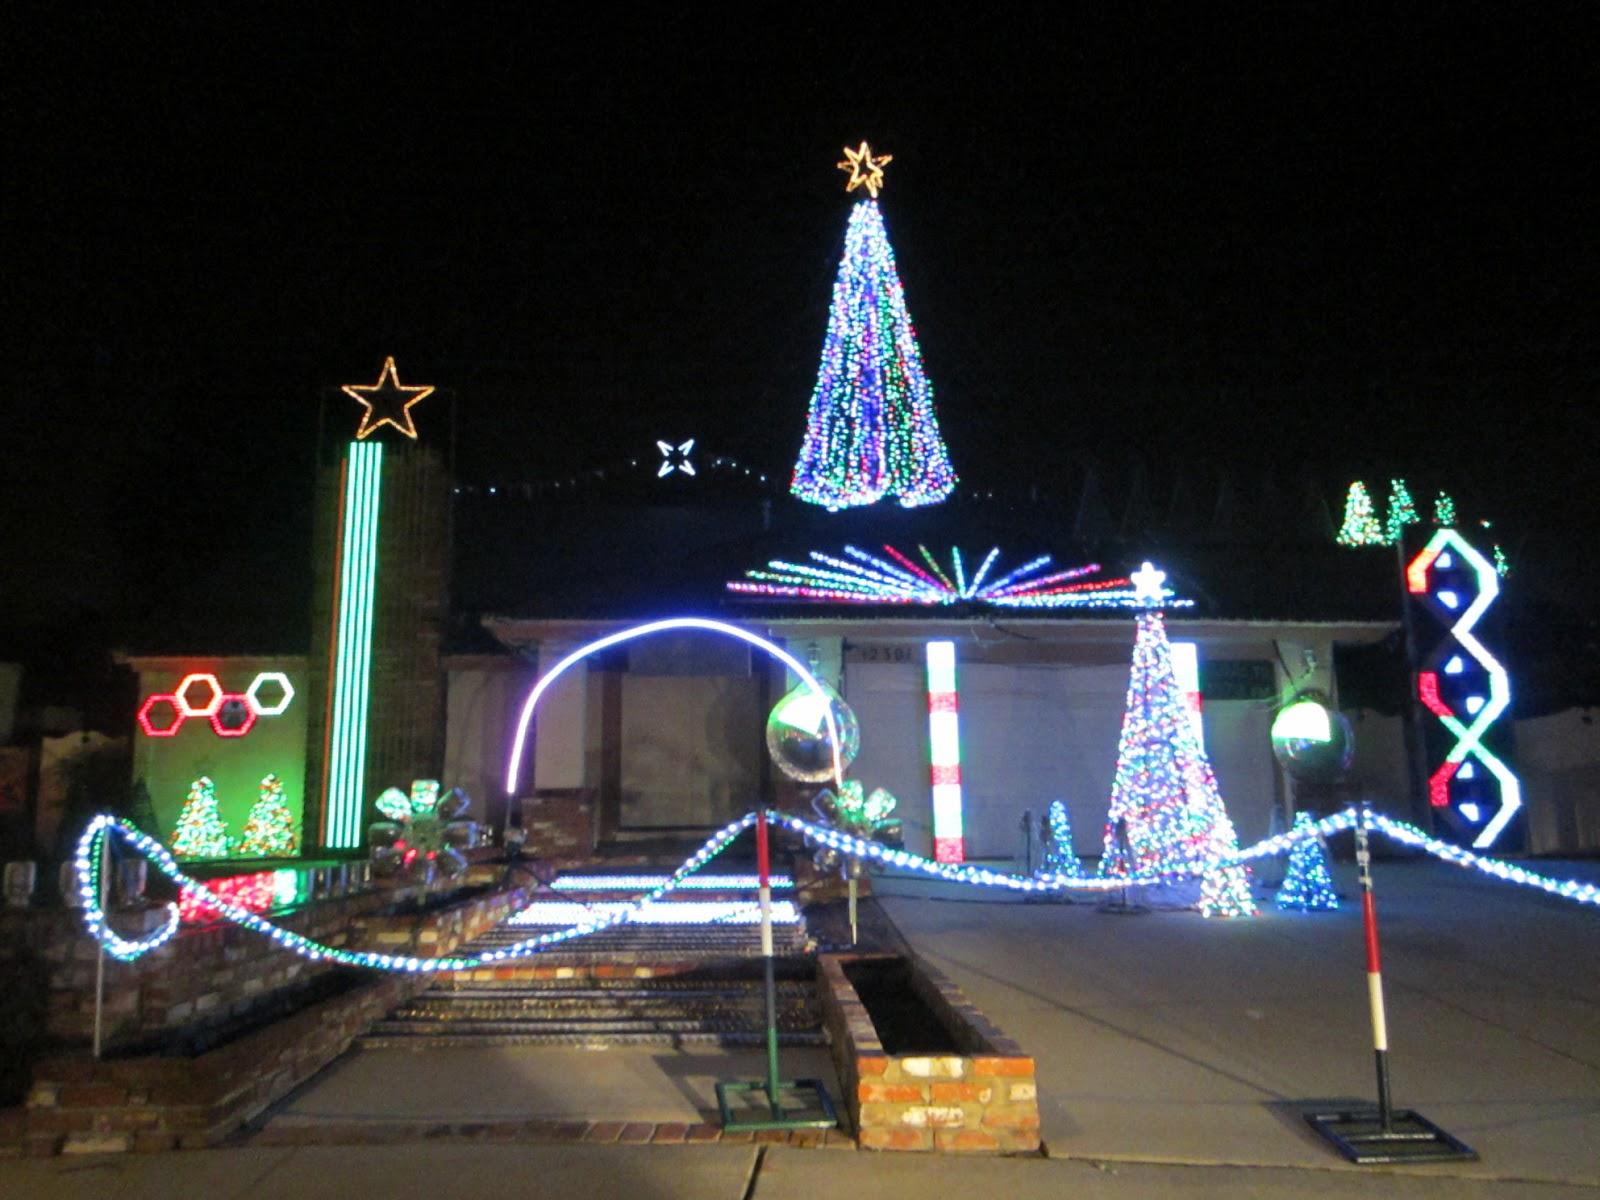 san antonio lights in chino ca - Chino Christmas Lights